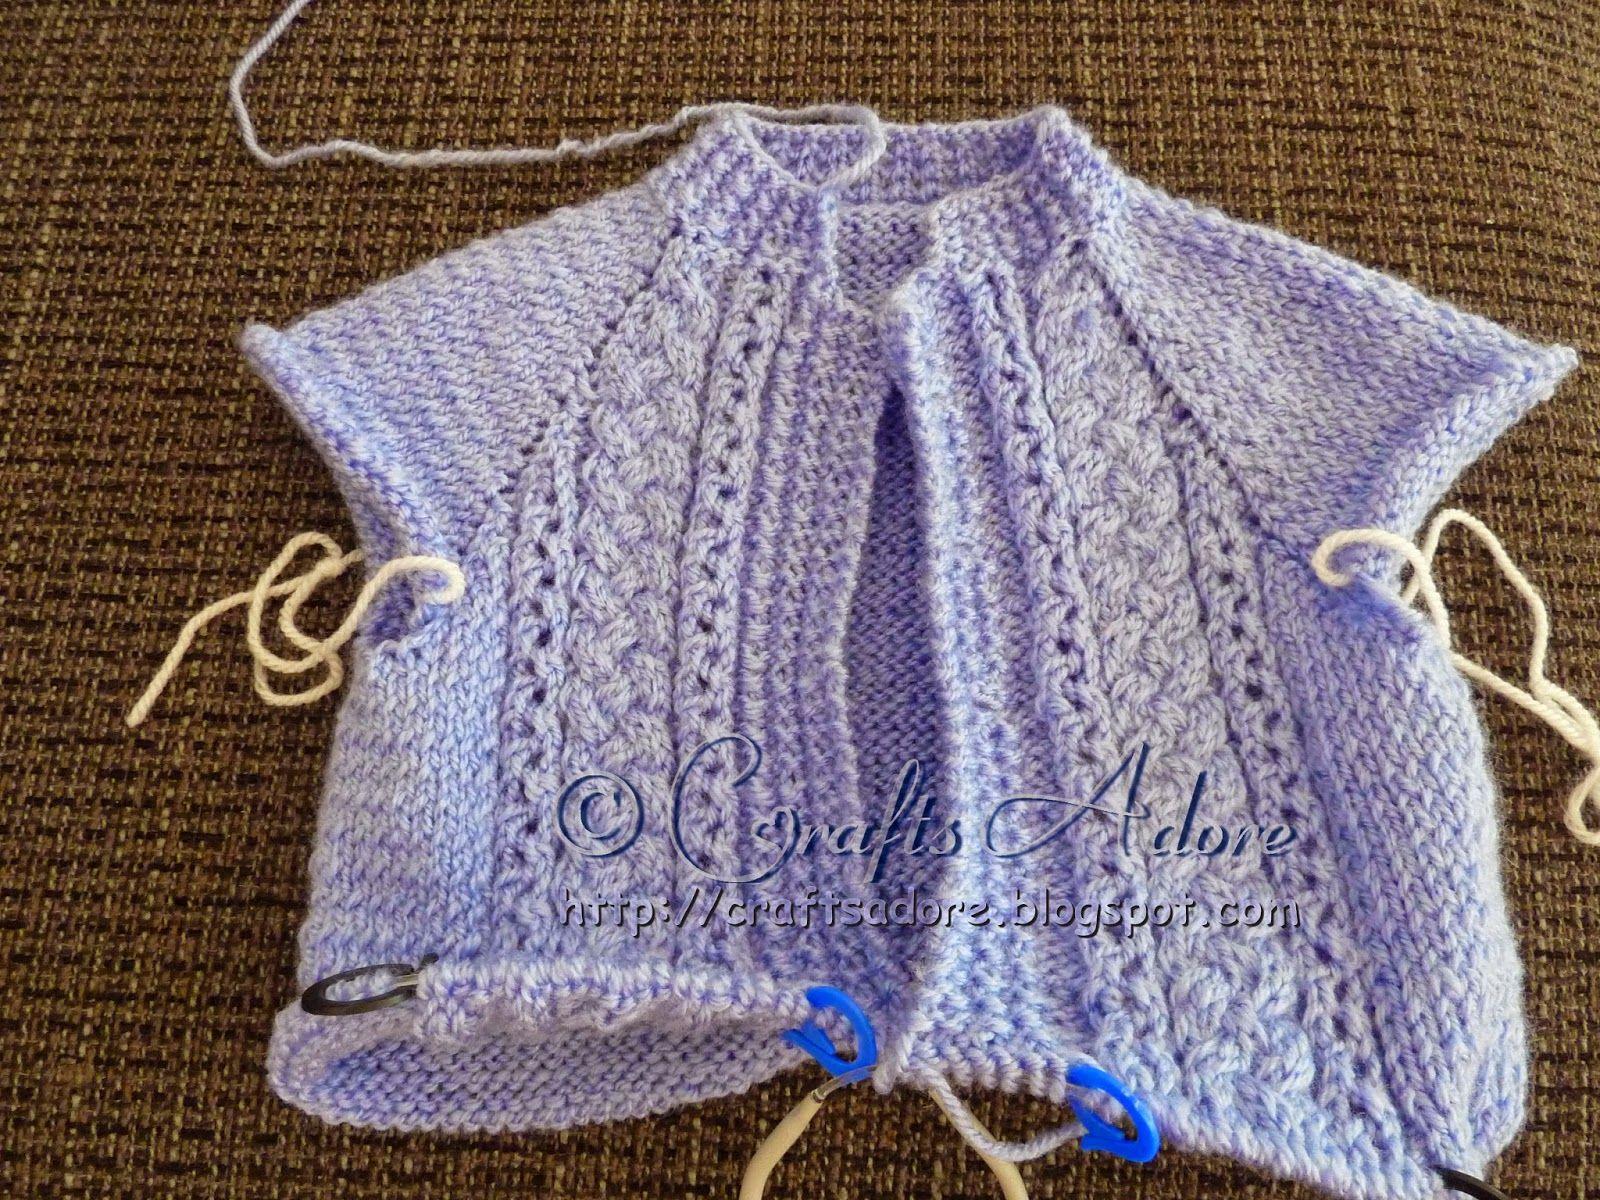 Knitted Baby Boy Cardigan Free Pattern | Baby knits | Pinterest ...